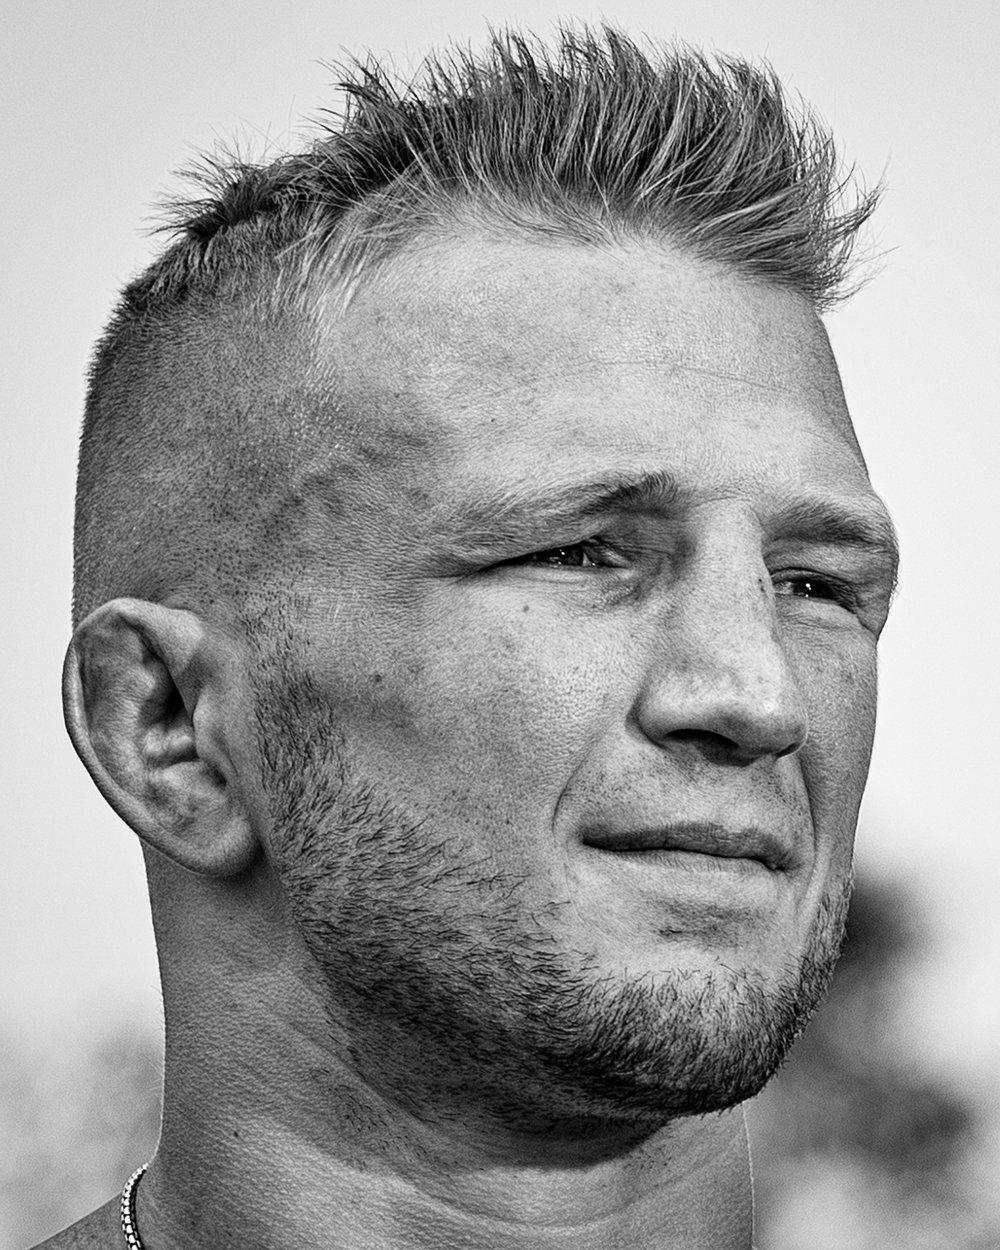 TJ Dillashaw, UFC Bantamweight Champion